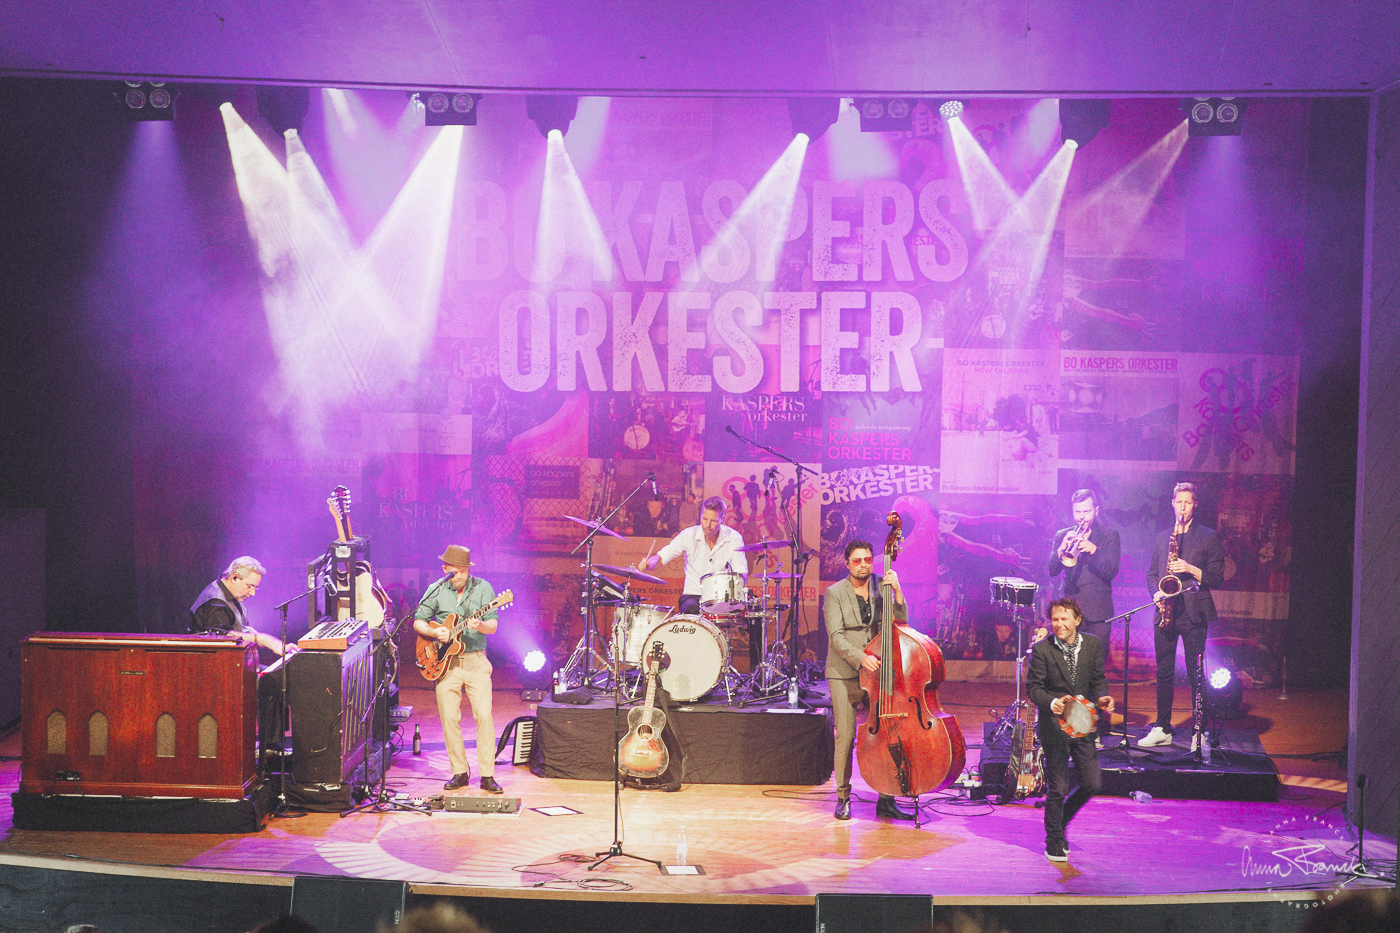 anna, franck, photography, bo, kaspers, orkester, karlstad, musik, music, concert konsert,  mariebergsskogen